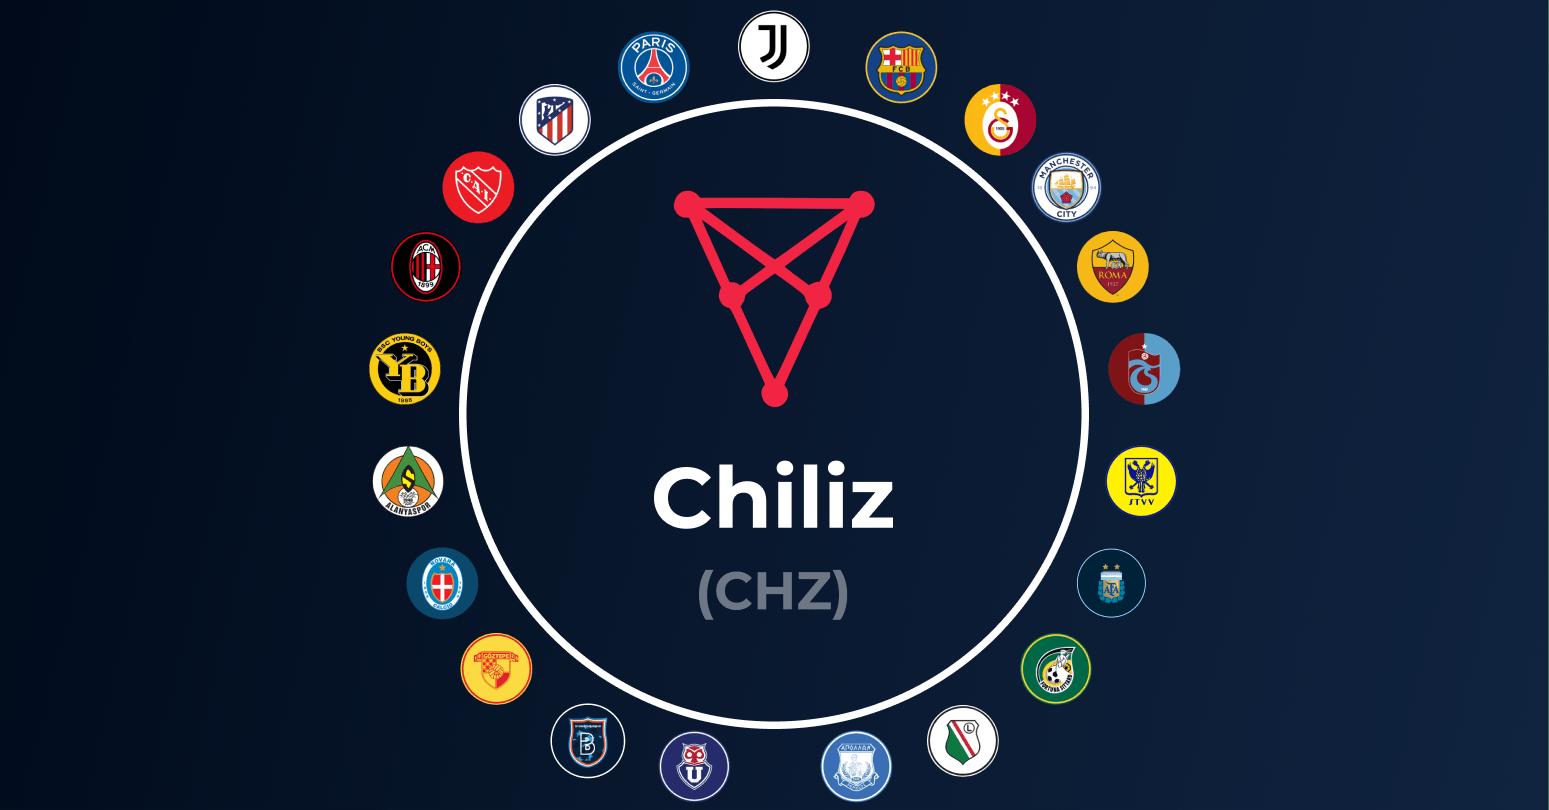 Chiliz Fan Coin